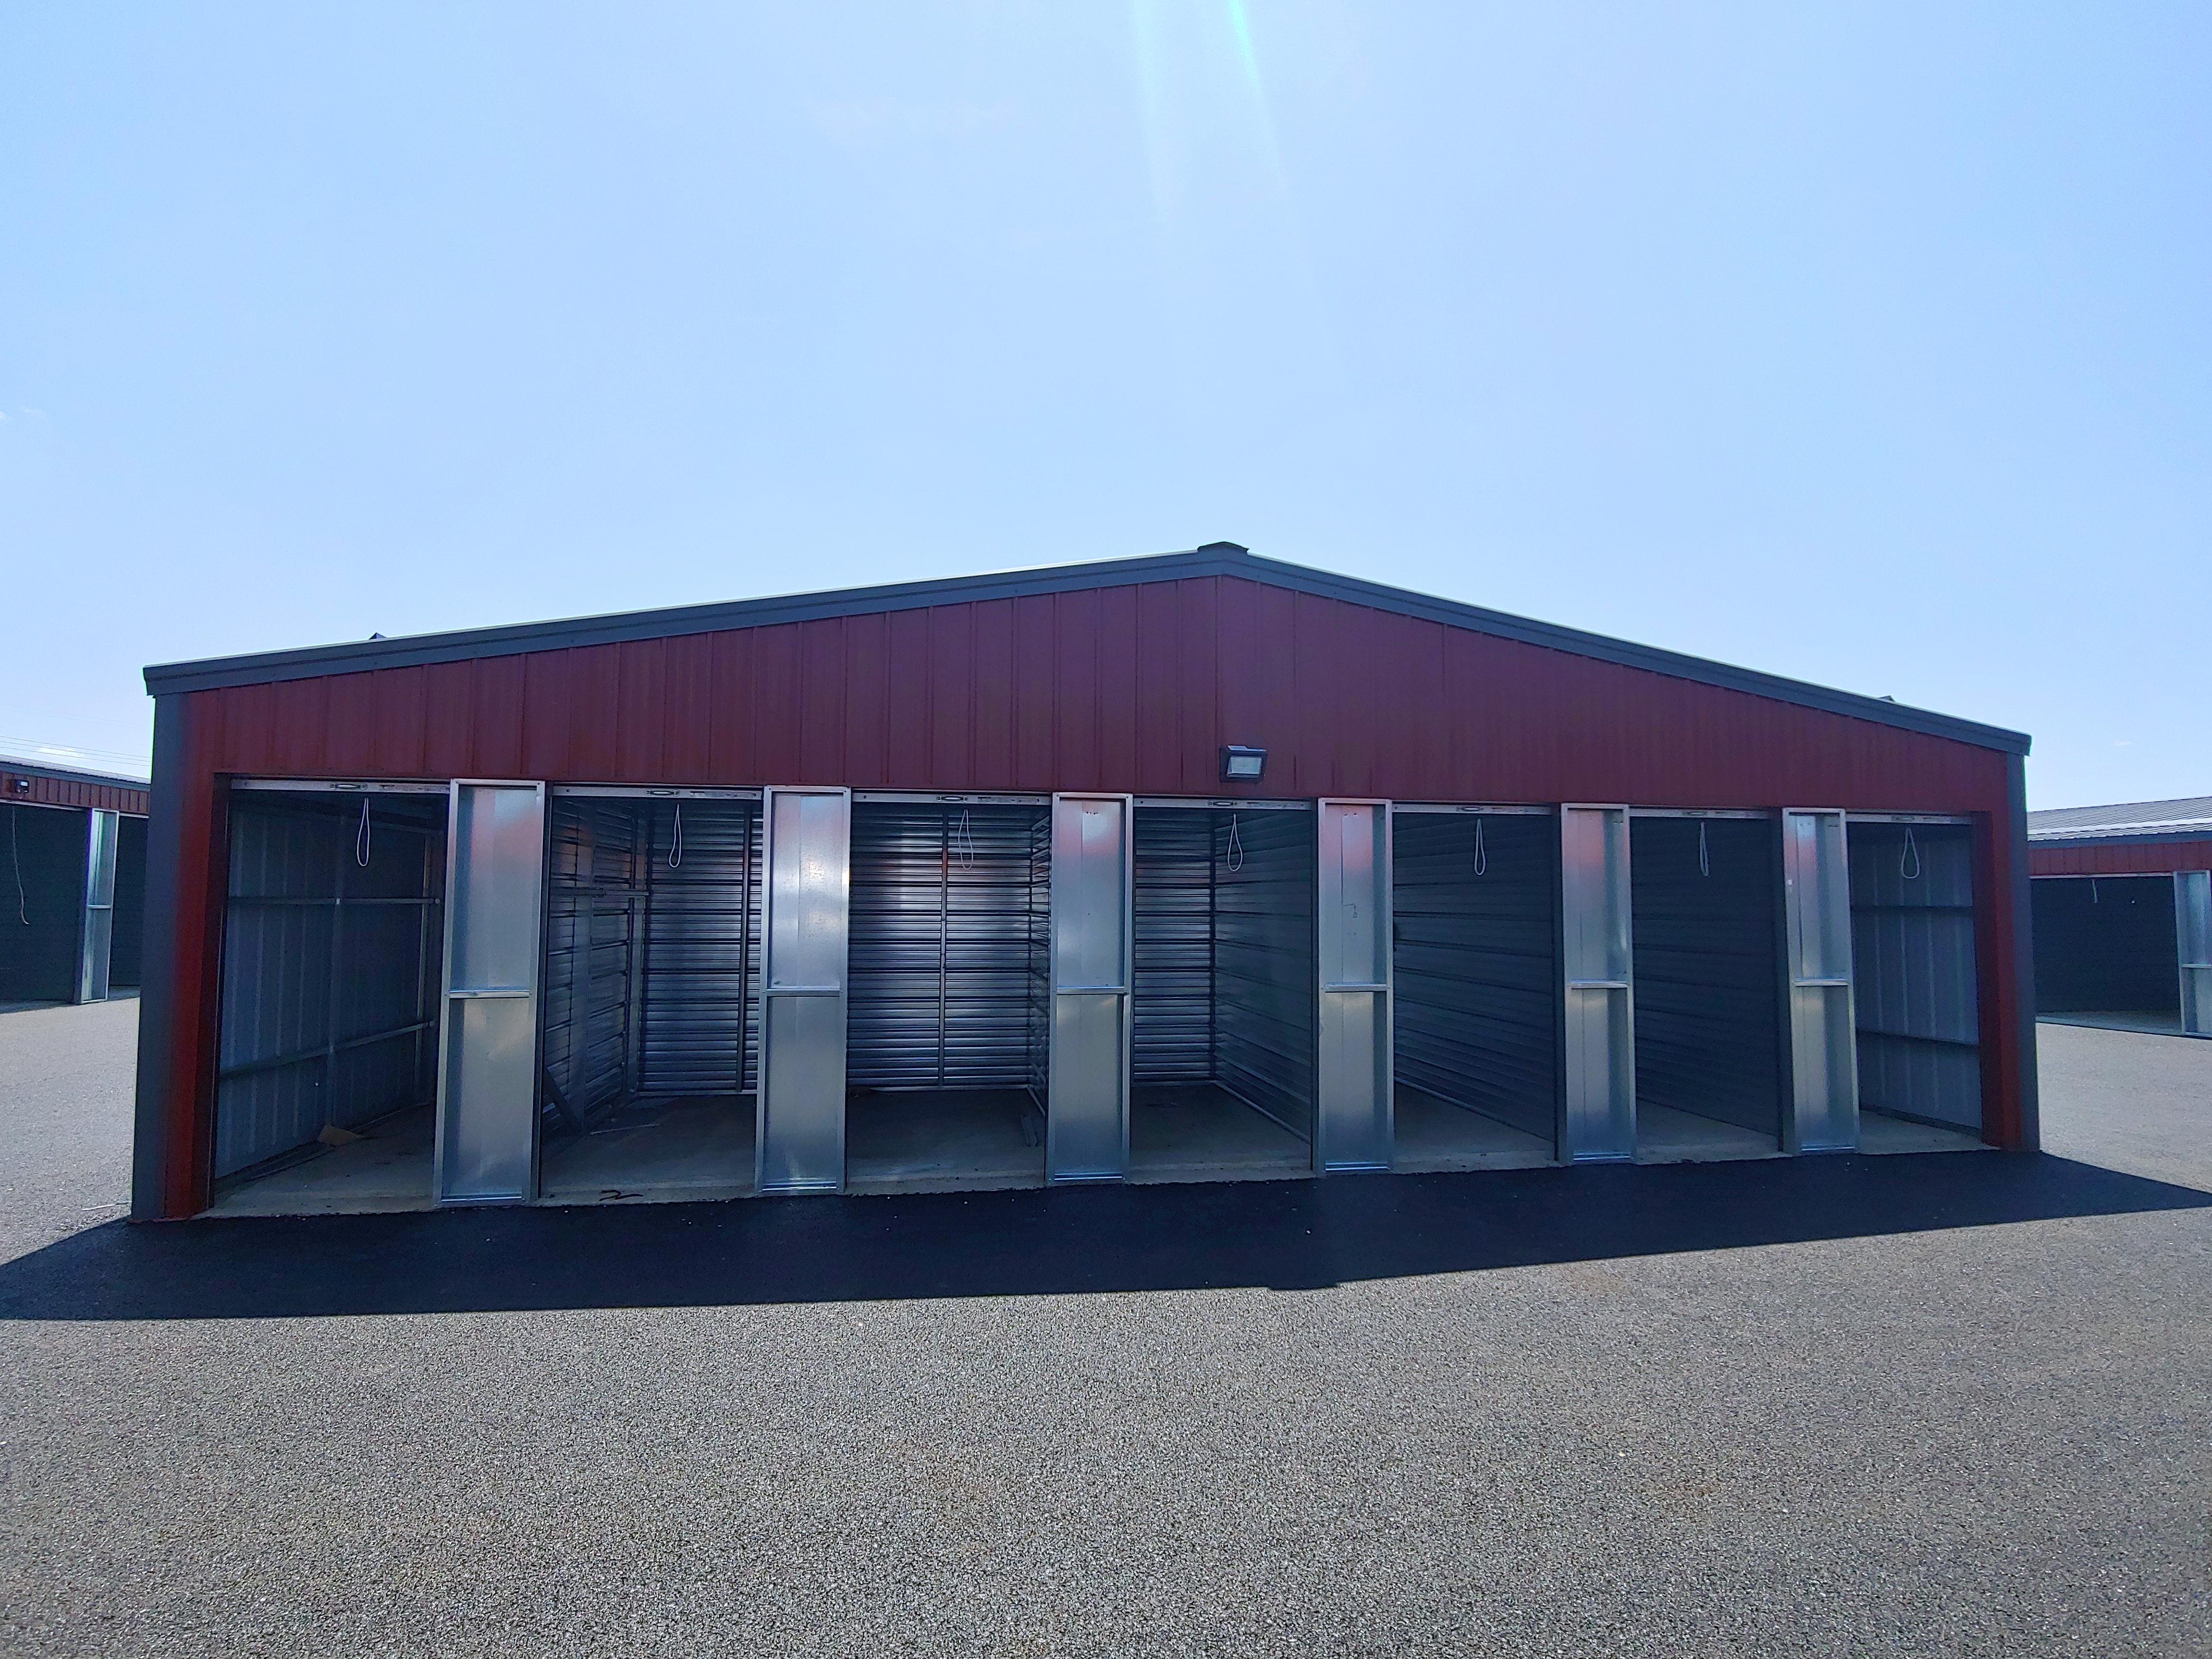 Medium Sized Self Storage Units